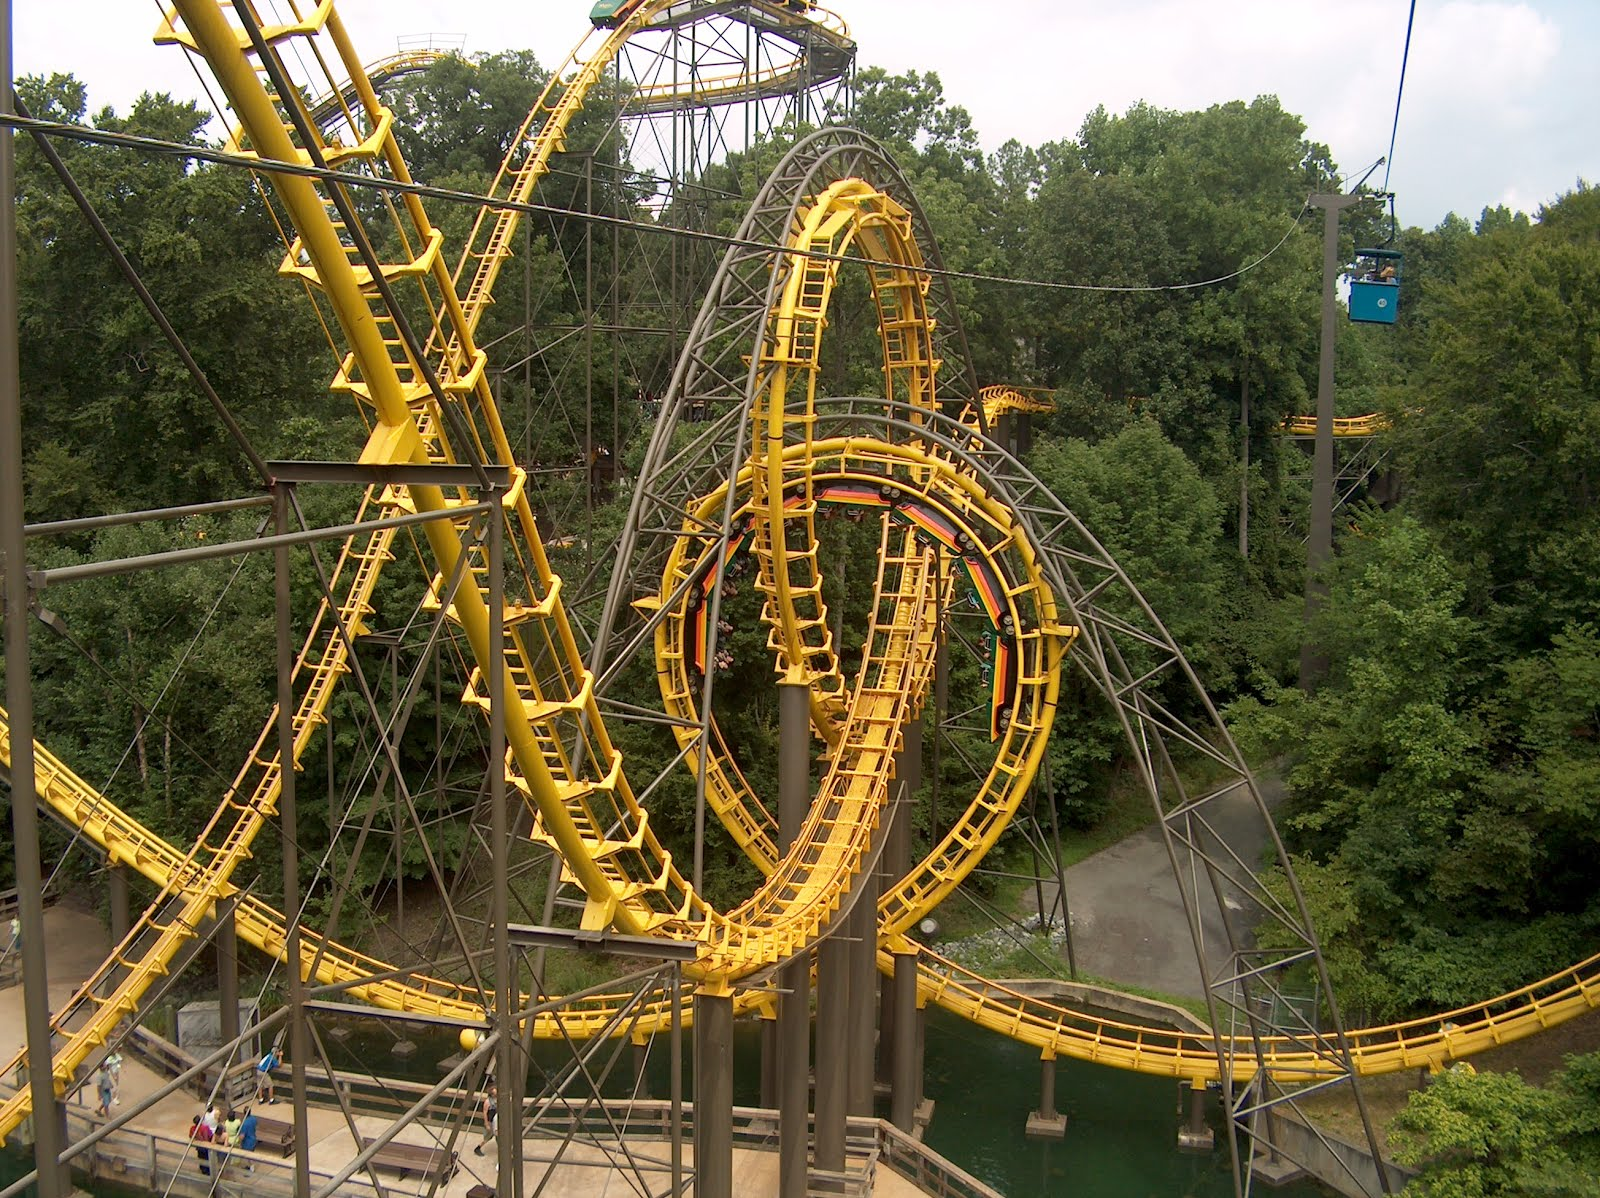 Old Fashioned Busch Gardens Roller Coaster Illustration - Brown ...